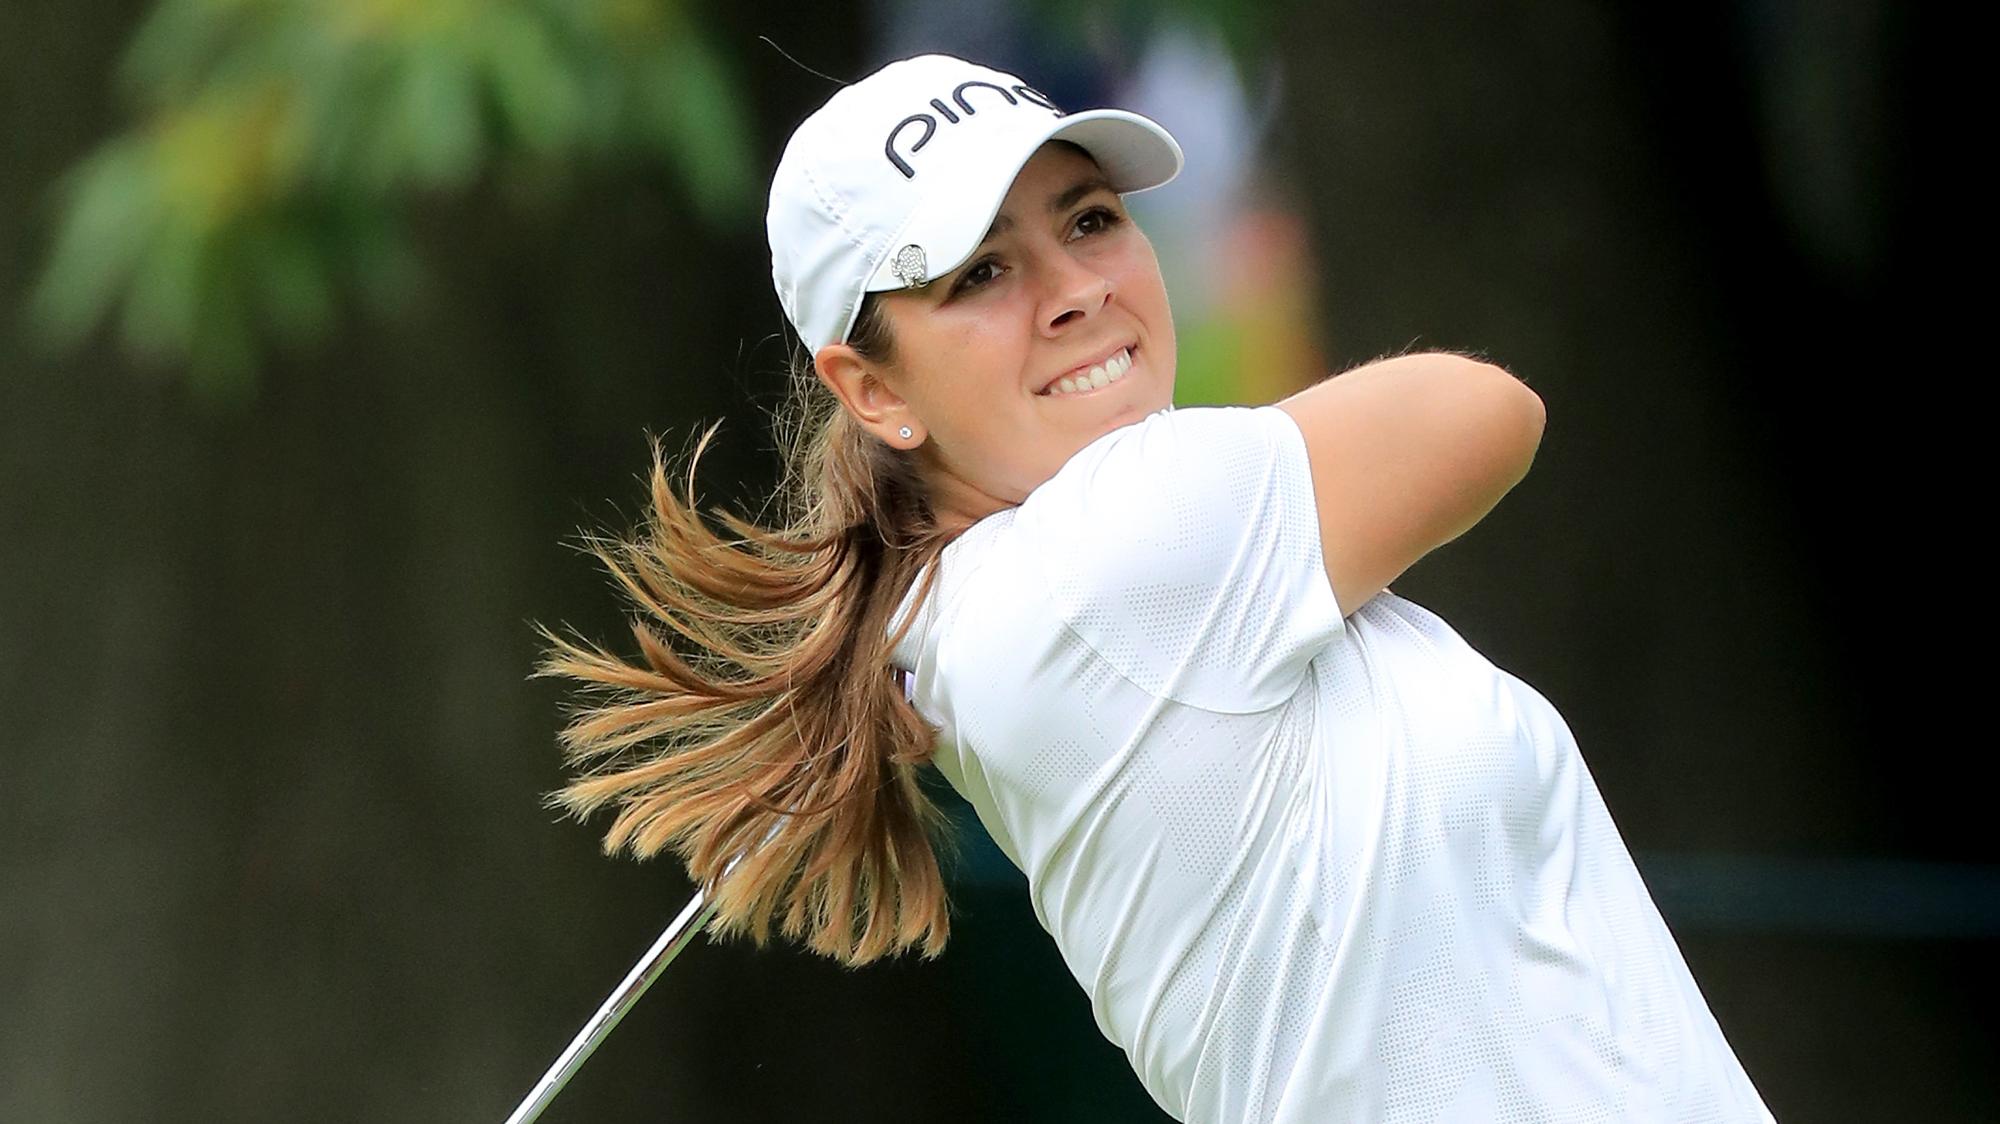 2019 Gillman Making Presence Felt on Tour This Season | LPGA | Ladies Professional Golf Association